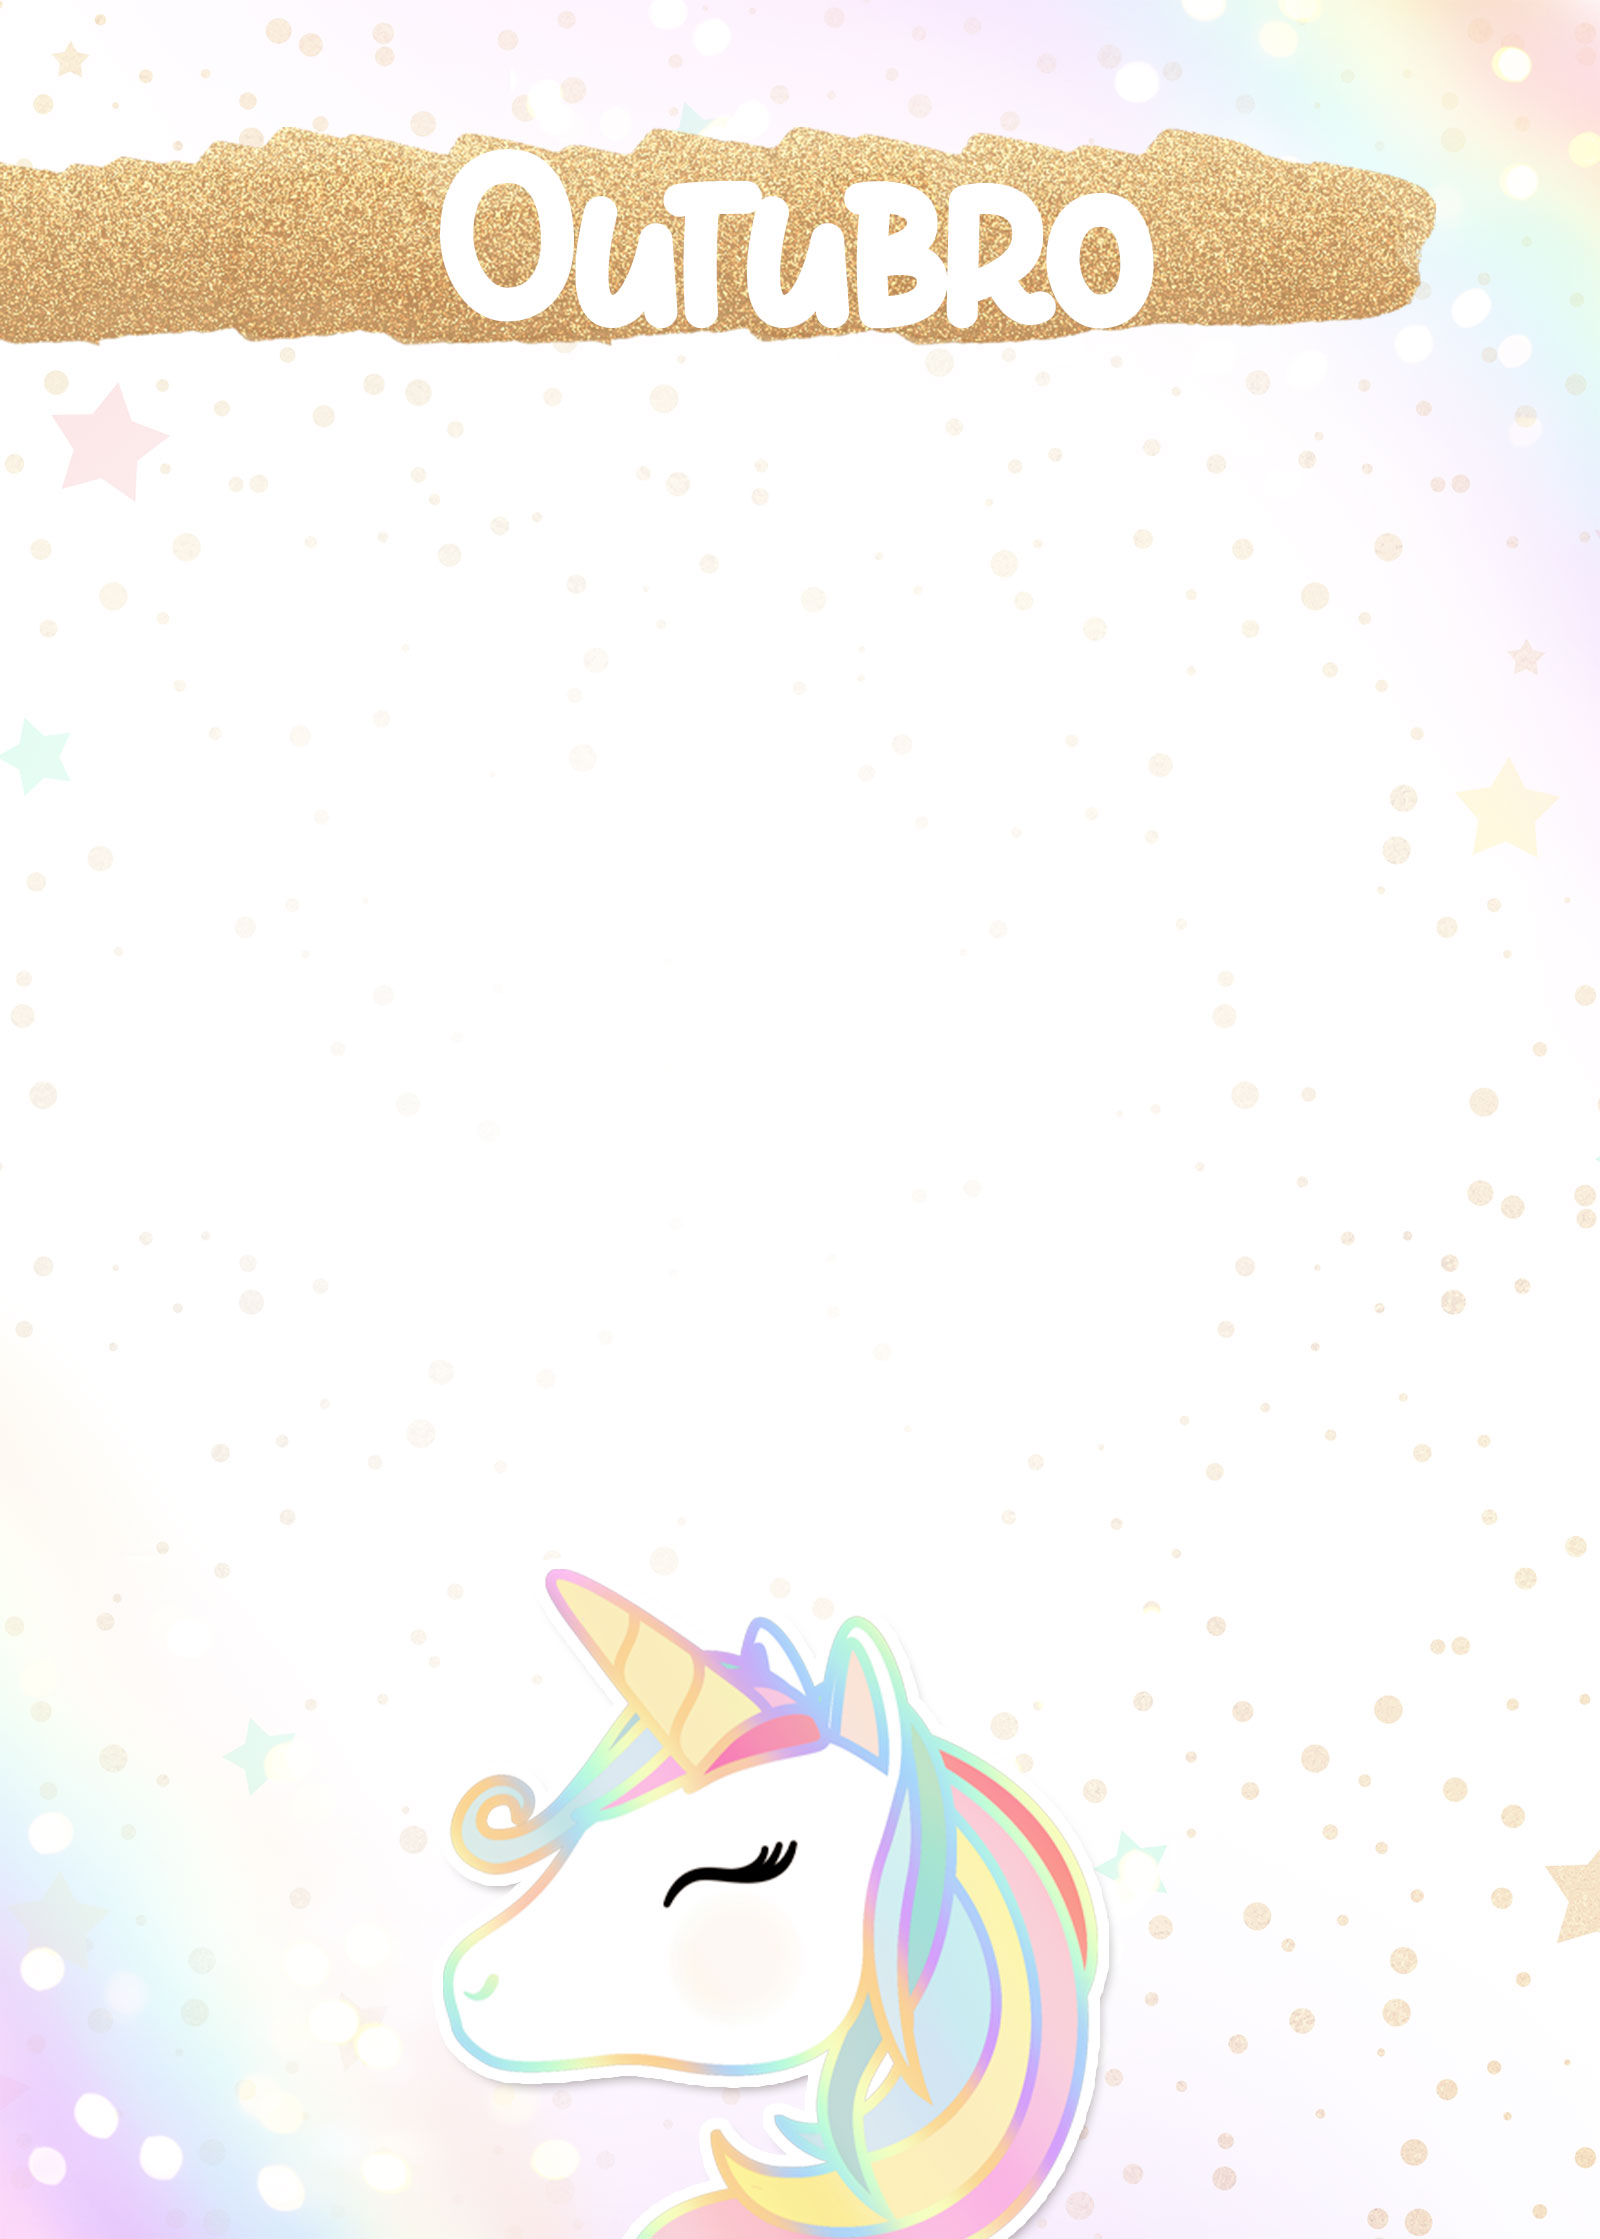 Planner Unicornio 2019 capa outubro